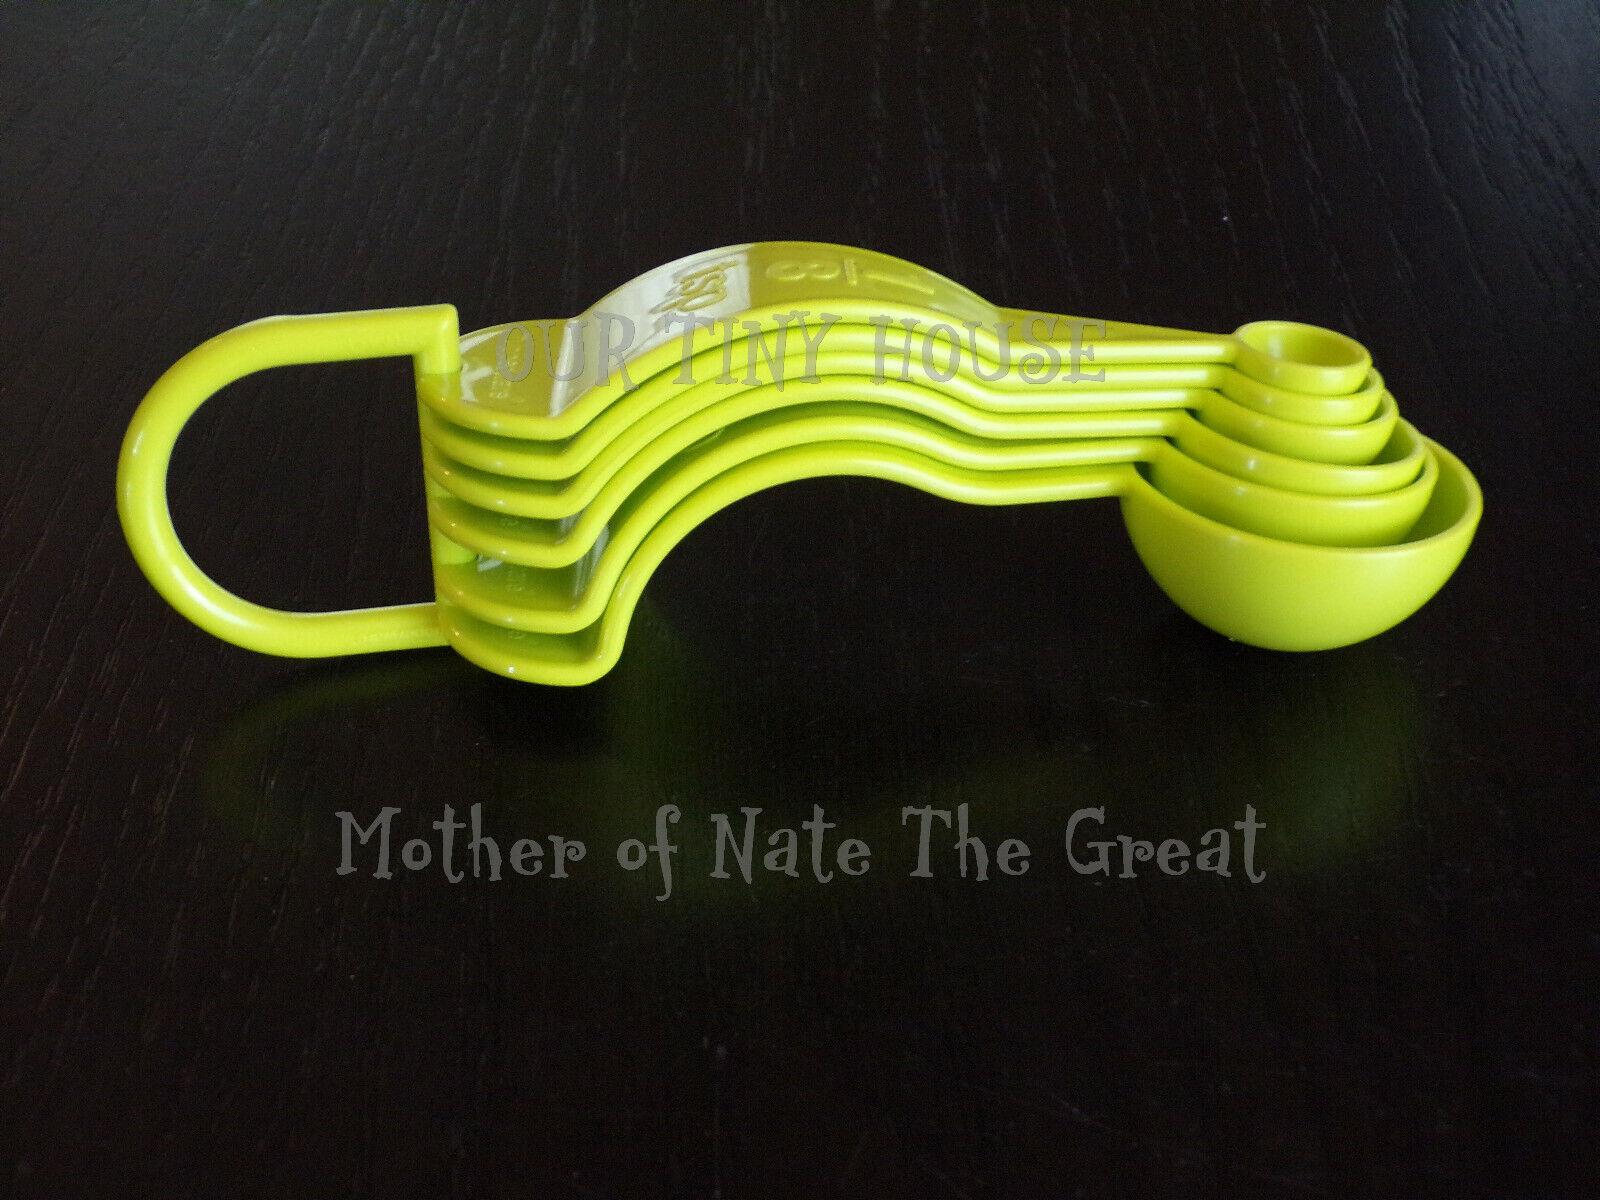 NEW Tupperware Measuring Spoons Set of 6 GREEN Embossed D Ri